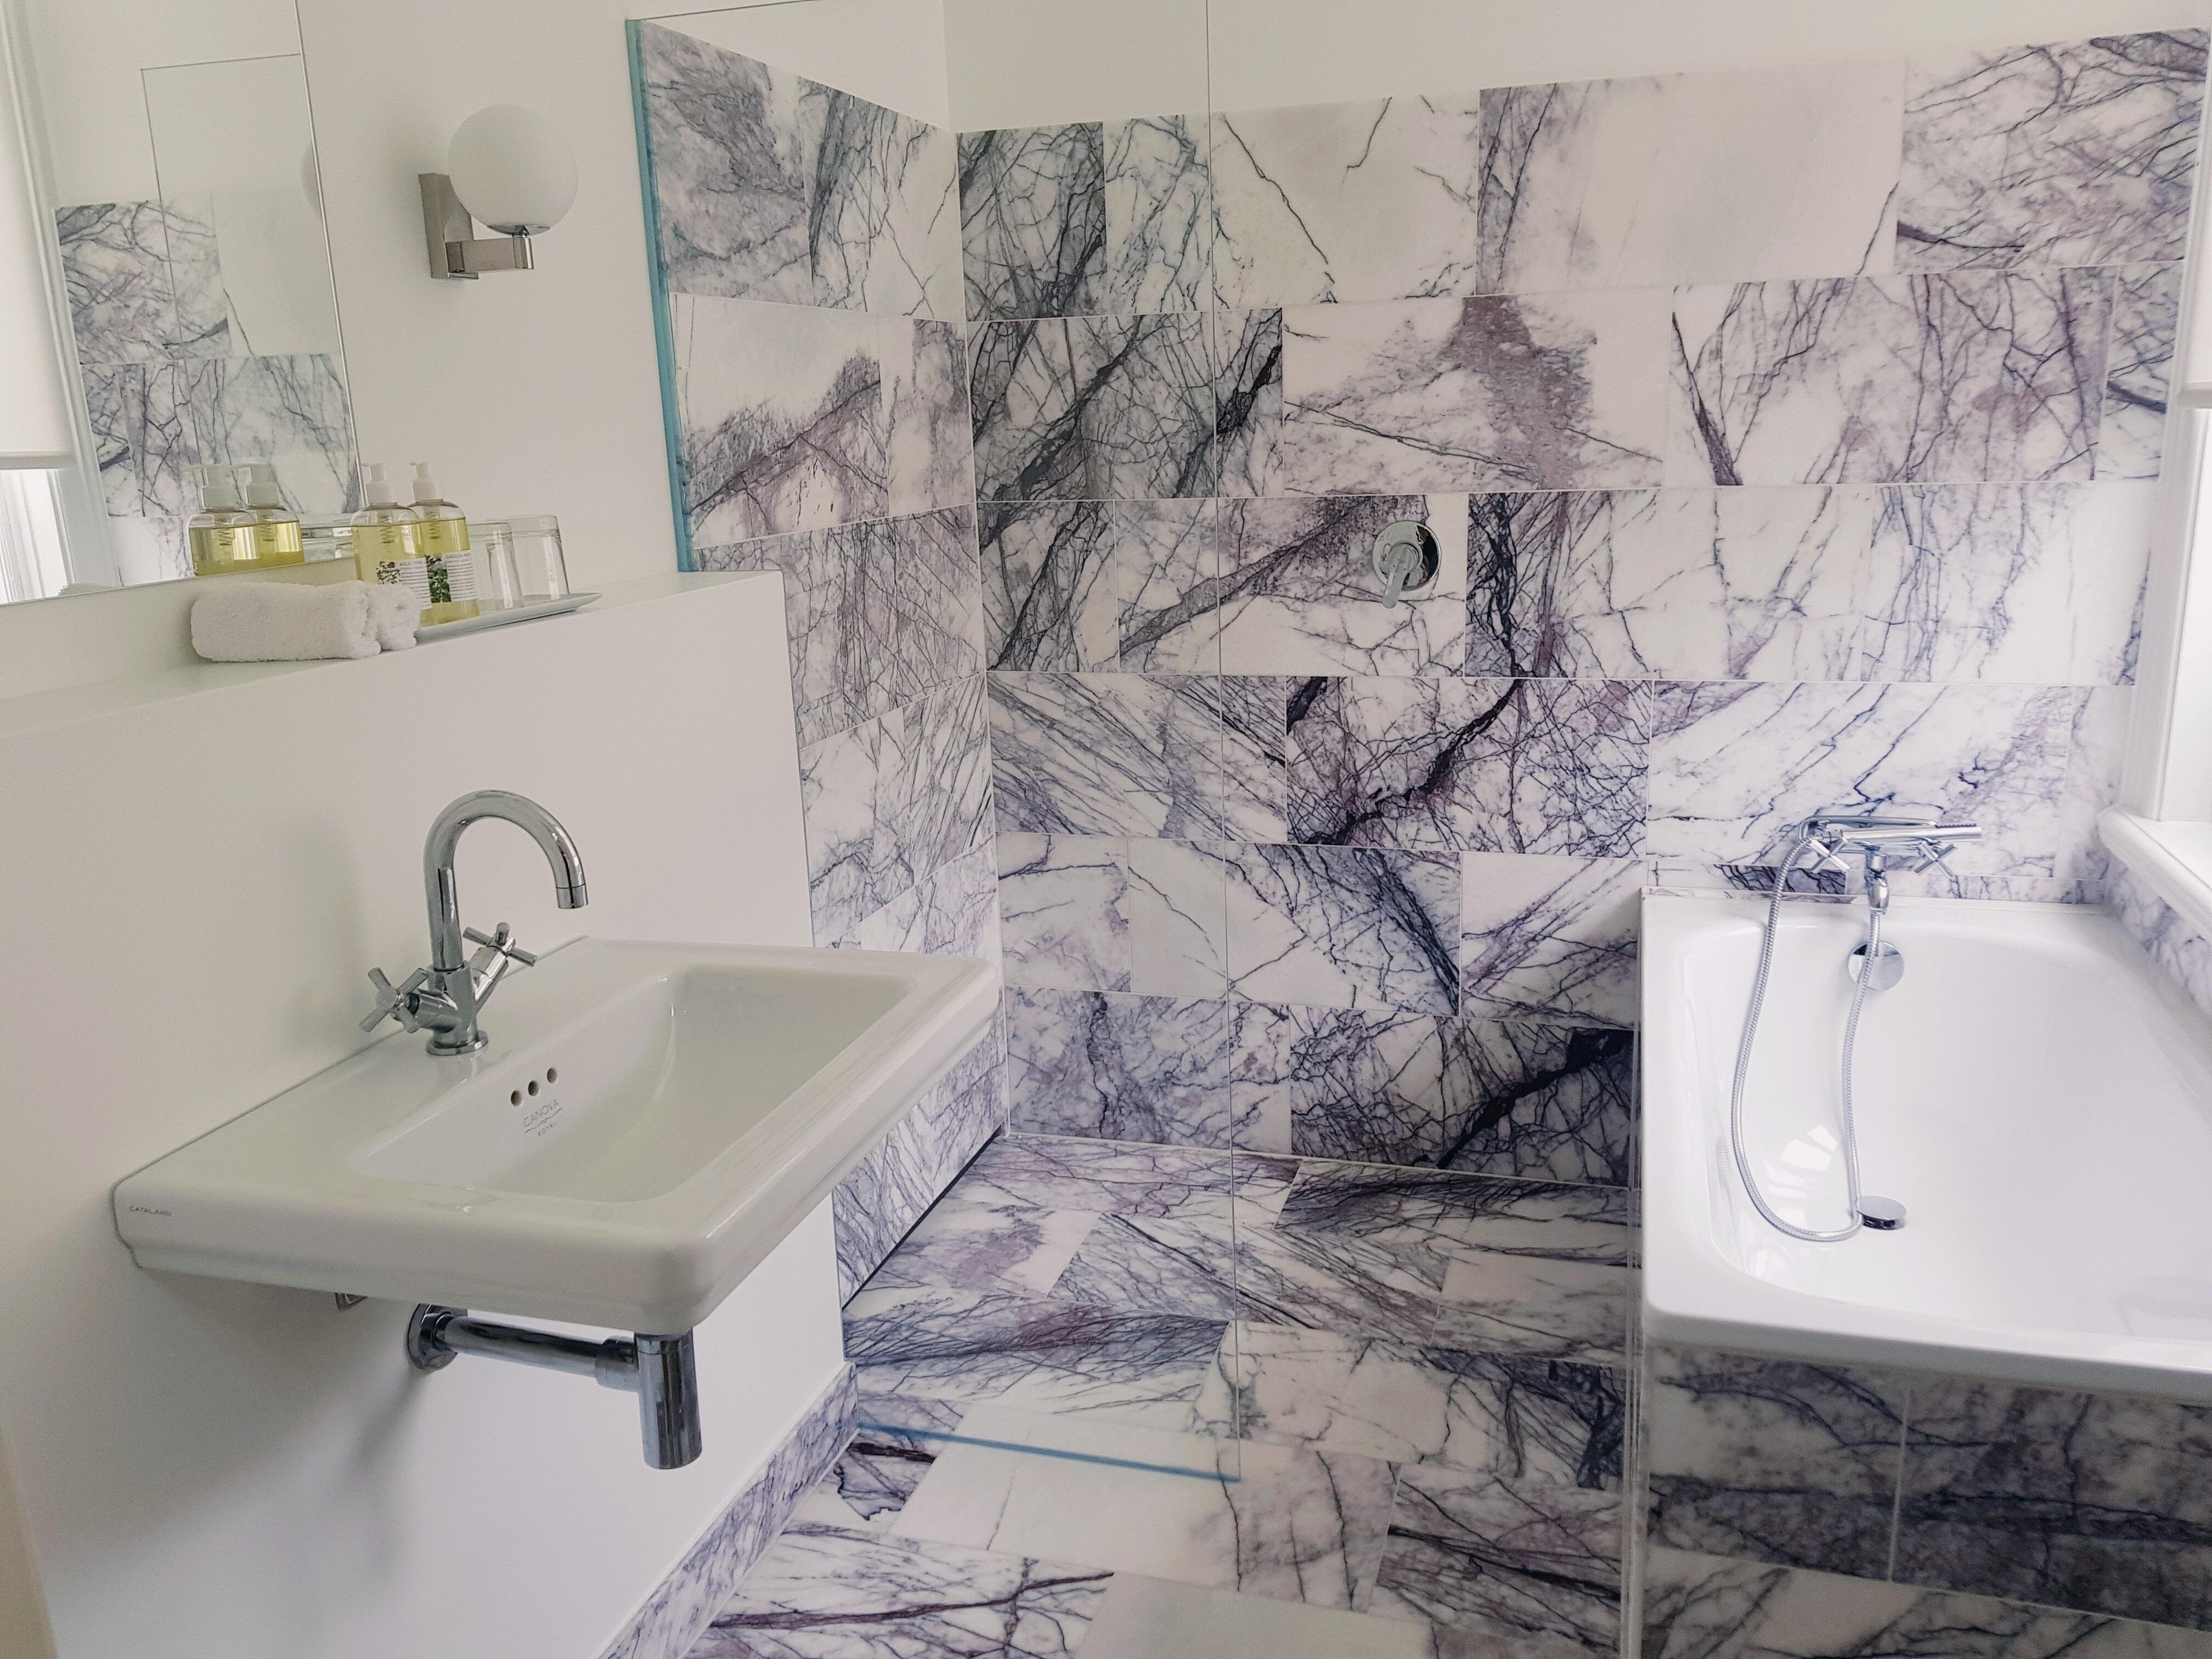 Classic Rooms at Pr�stg�rden Hotel, S�derhamn